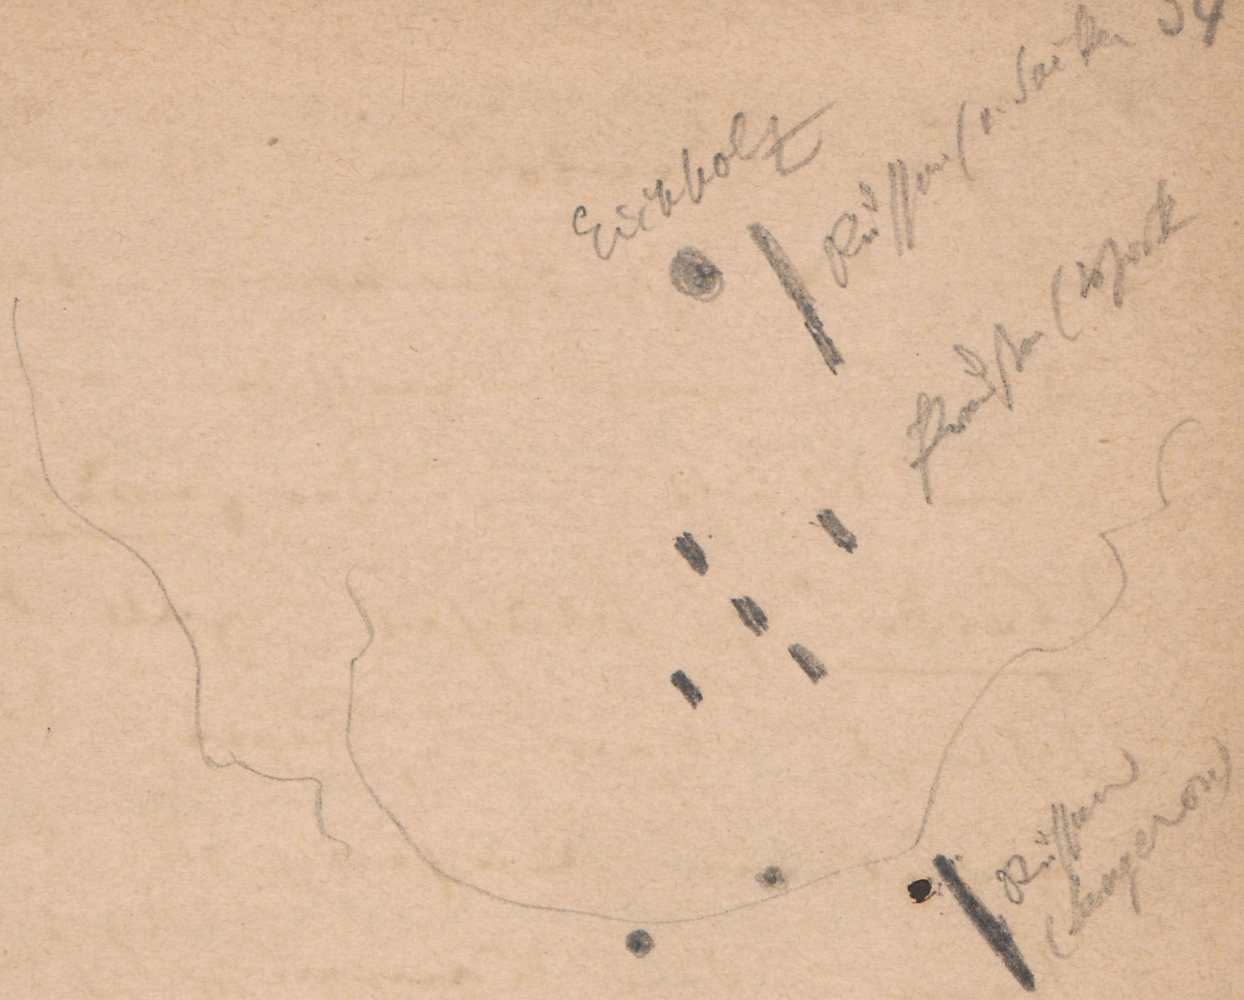 Lageplan des Schlachtfelds; Schlachtfeld an der KatzbachSchlachtfeldanderKatzbachKatzbach (Fluss; heute: poln. Kaczawa)Schlachtfeld an der Katzbach.